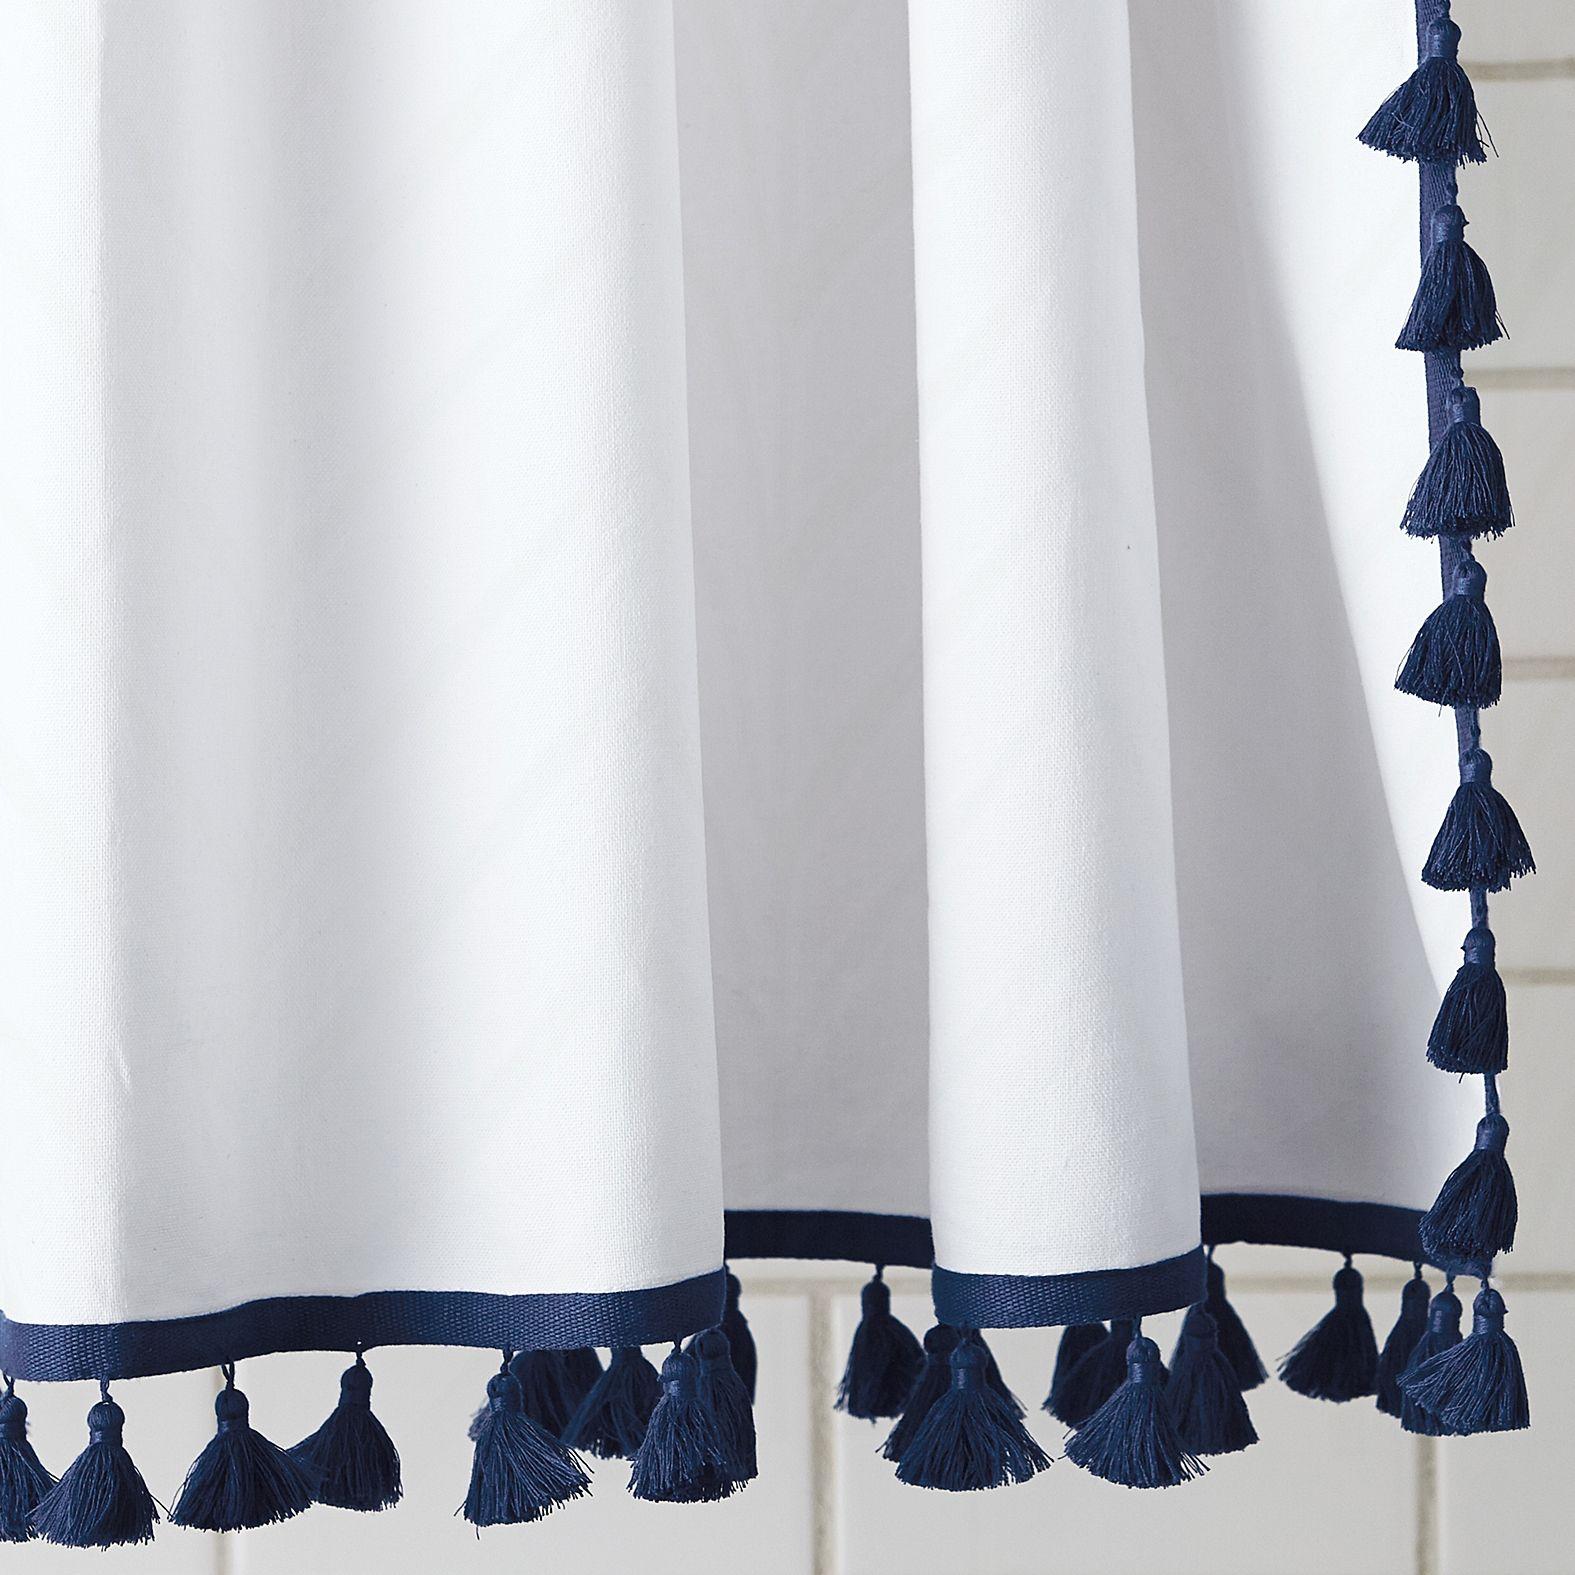 Tassel shower curtain navy puntadas pinterest - Cortinas y decoraciones ...